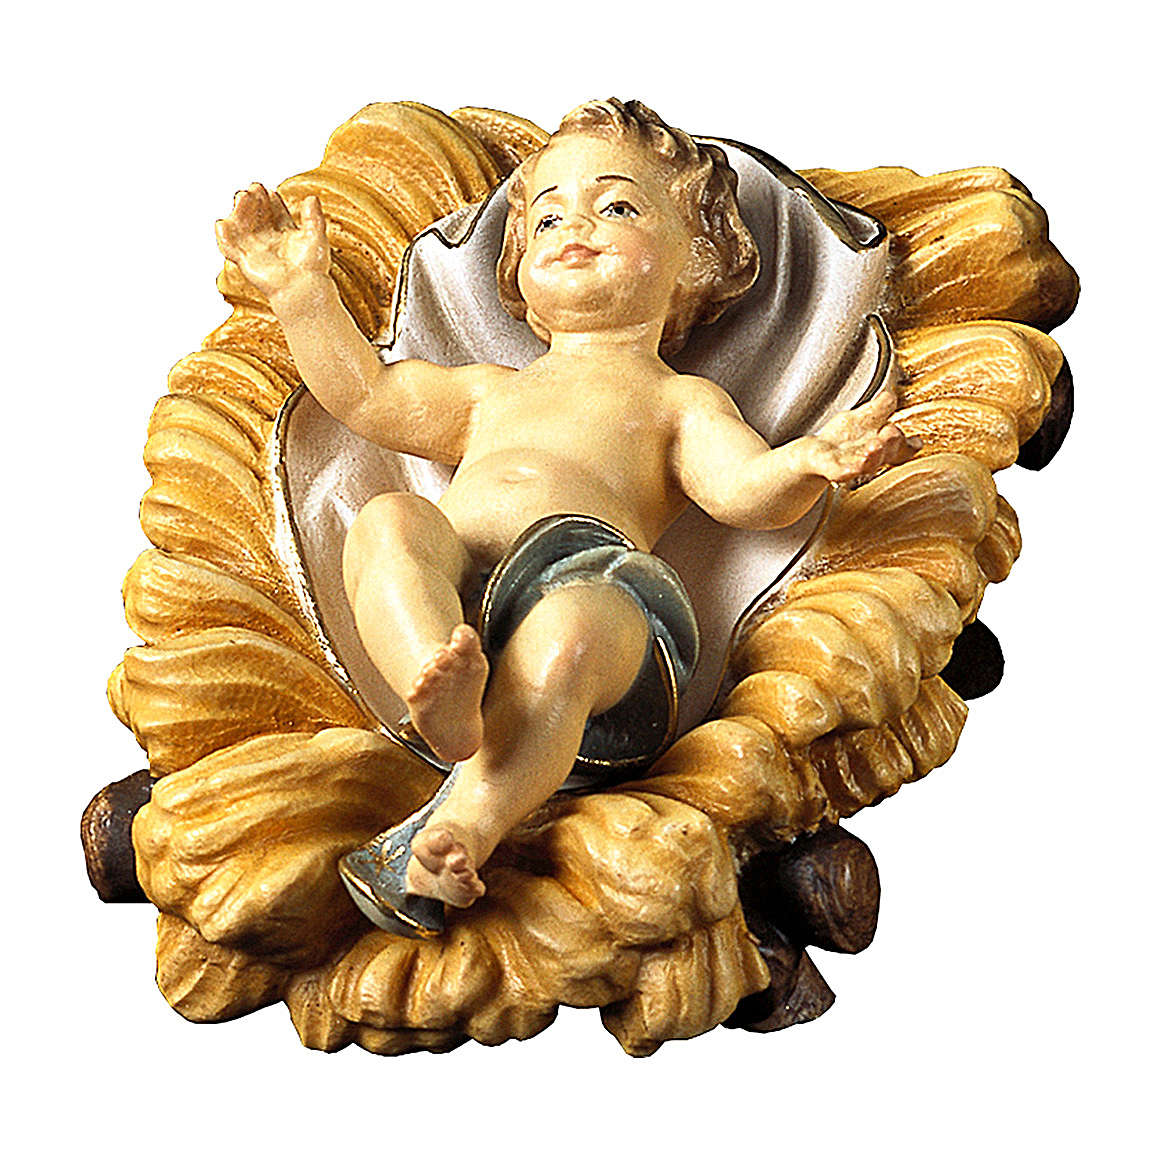 Gesù bambino con culla per presepe Original legno dipinto in Valgardena 12 cm 4